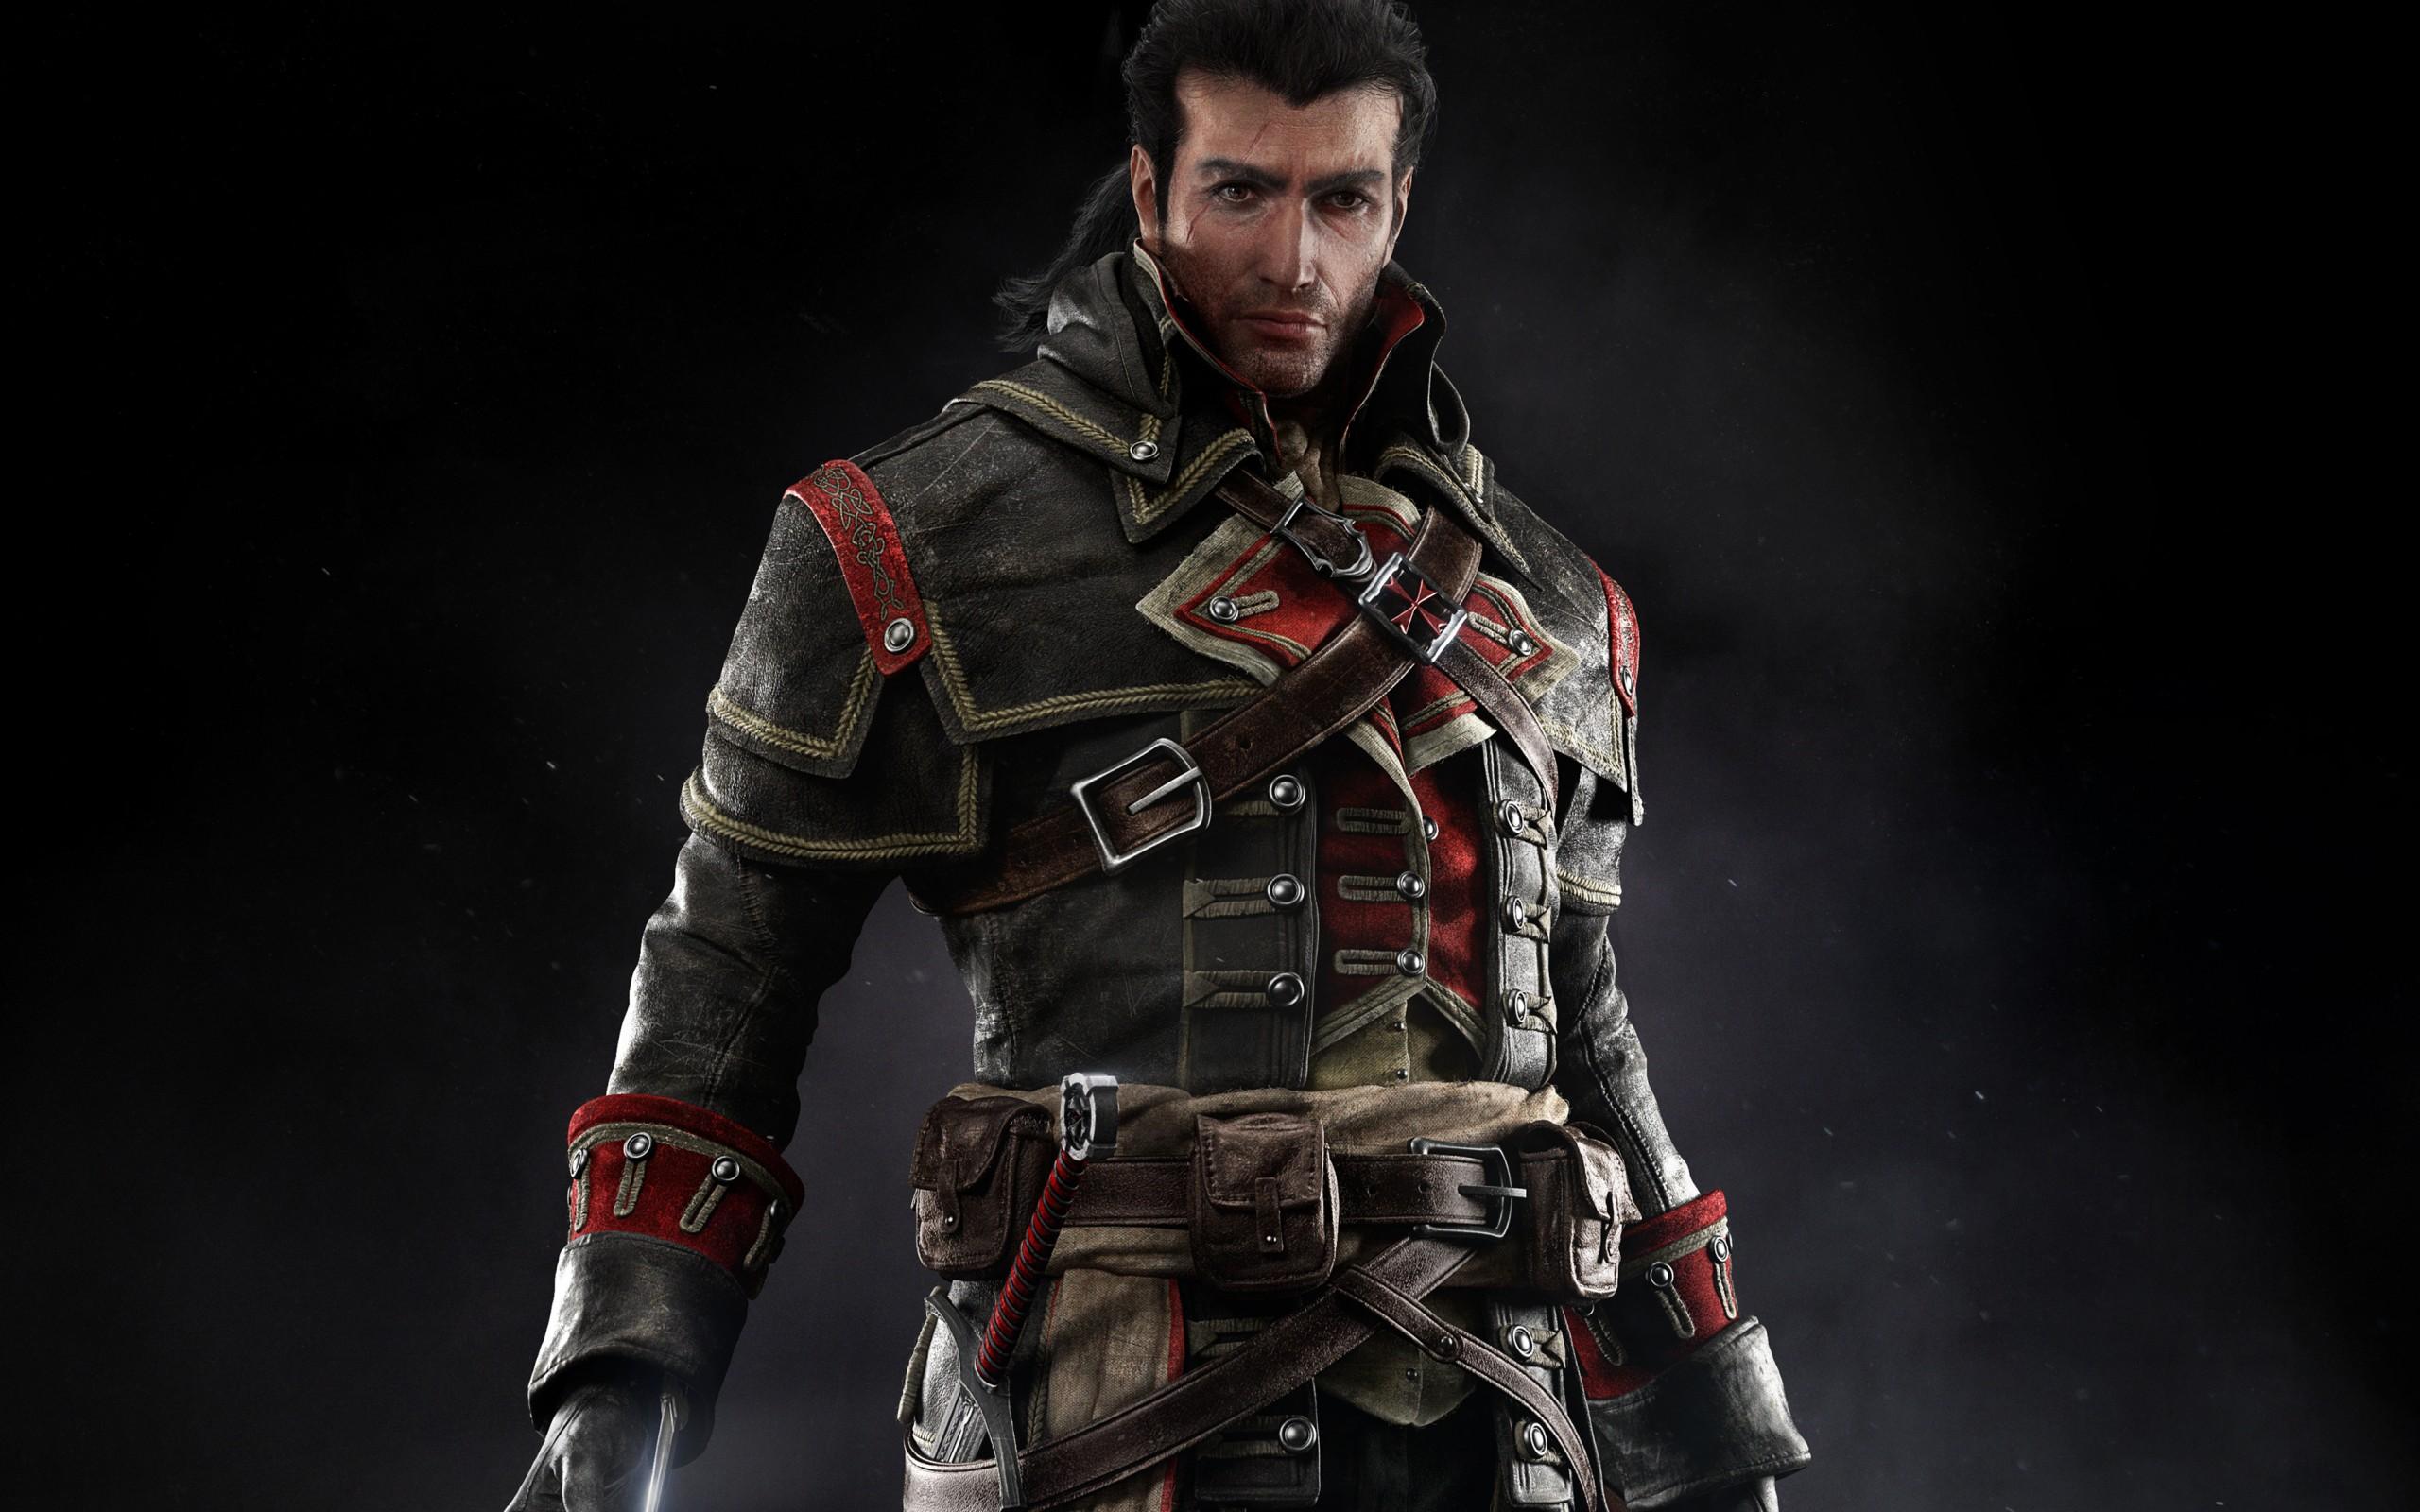 Preview Assassin's Creed Rogue - V roli lovce asasínů 9750